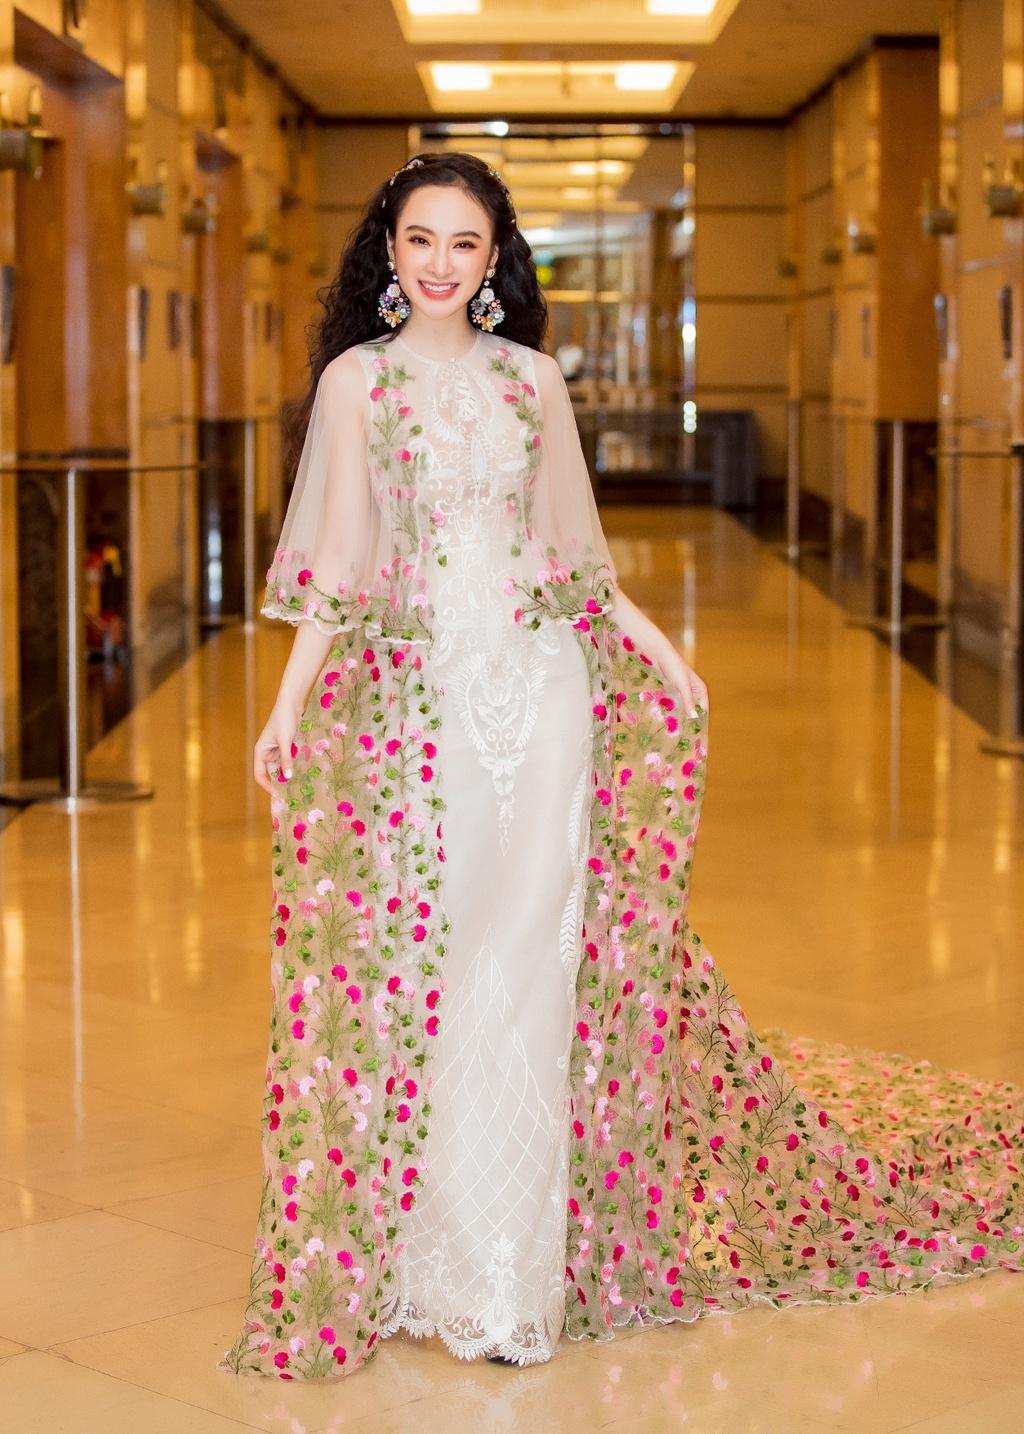 Angela Phuong Trinh hoa cong chua vay hoa, Sam quyen ru trong su kien hinh anh 1